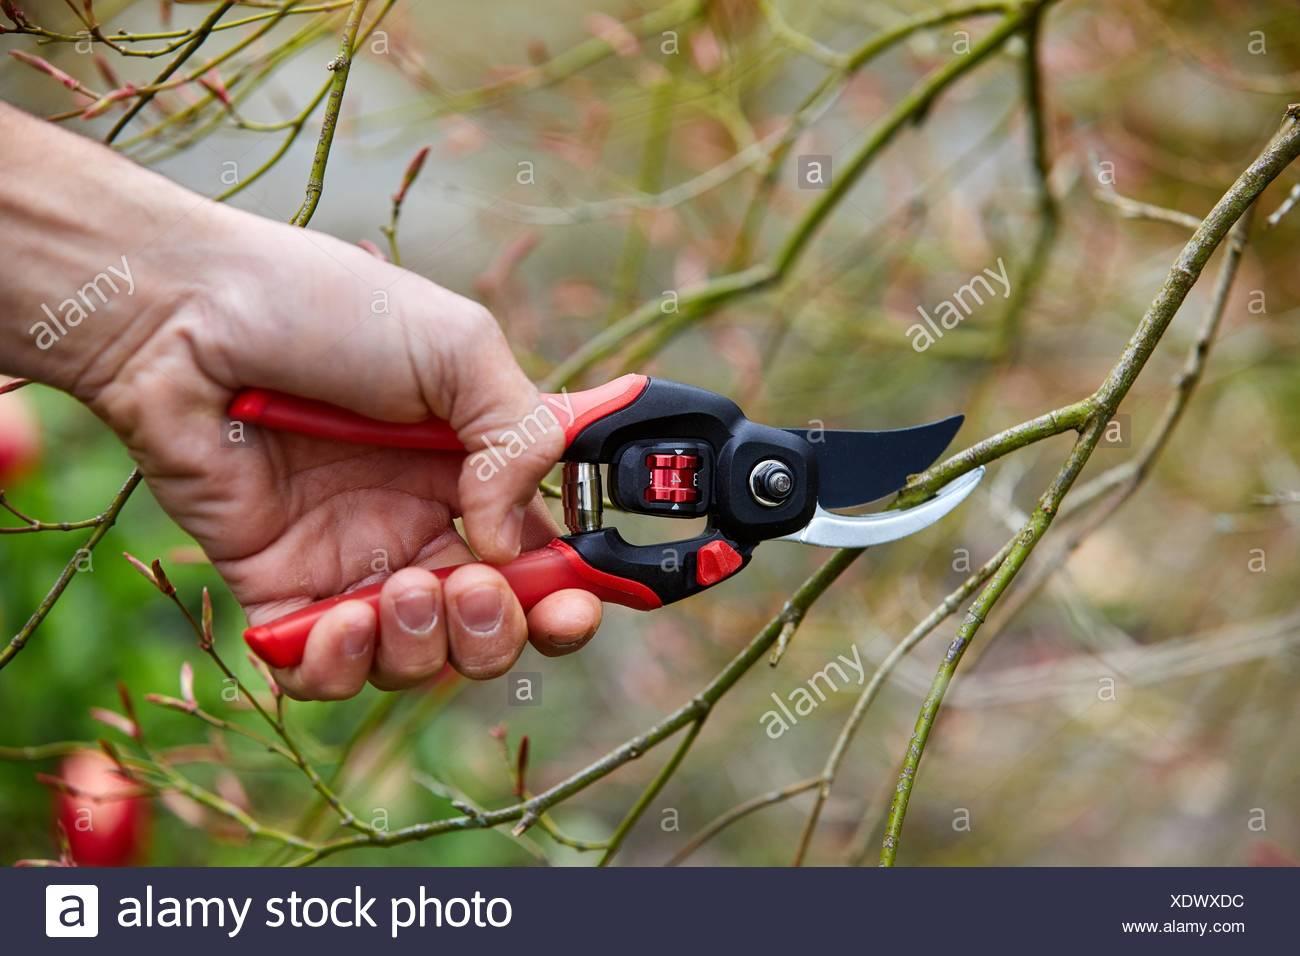 Gardener with hand tool, Pruner, Aiete Park, Donostia, San Sebastian, Gipuzkoa, Basque Country, Spain - Stock Image